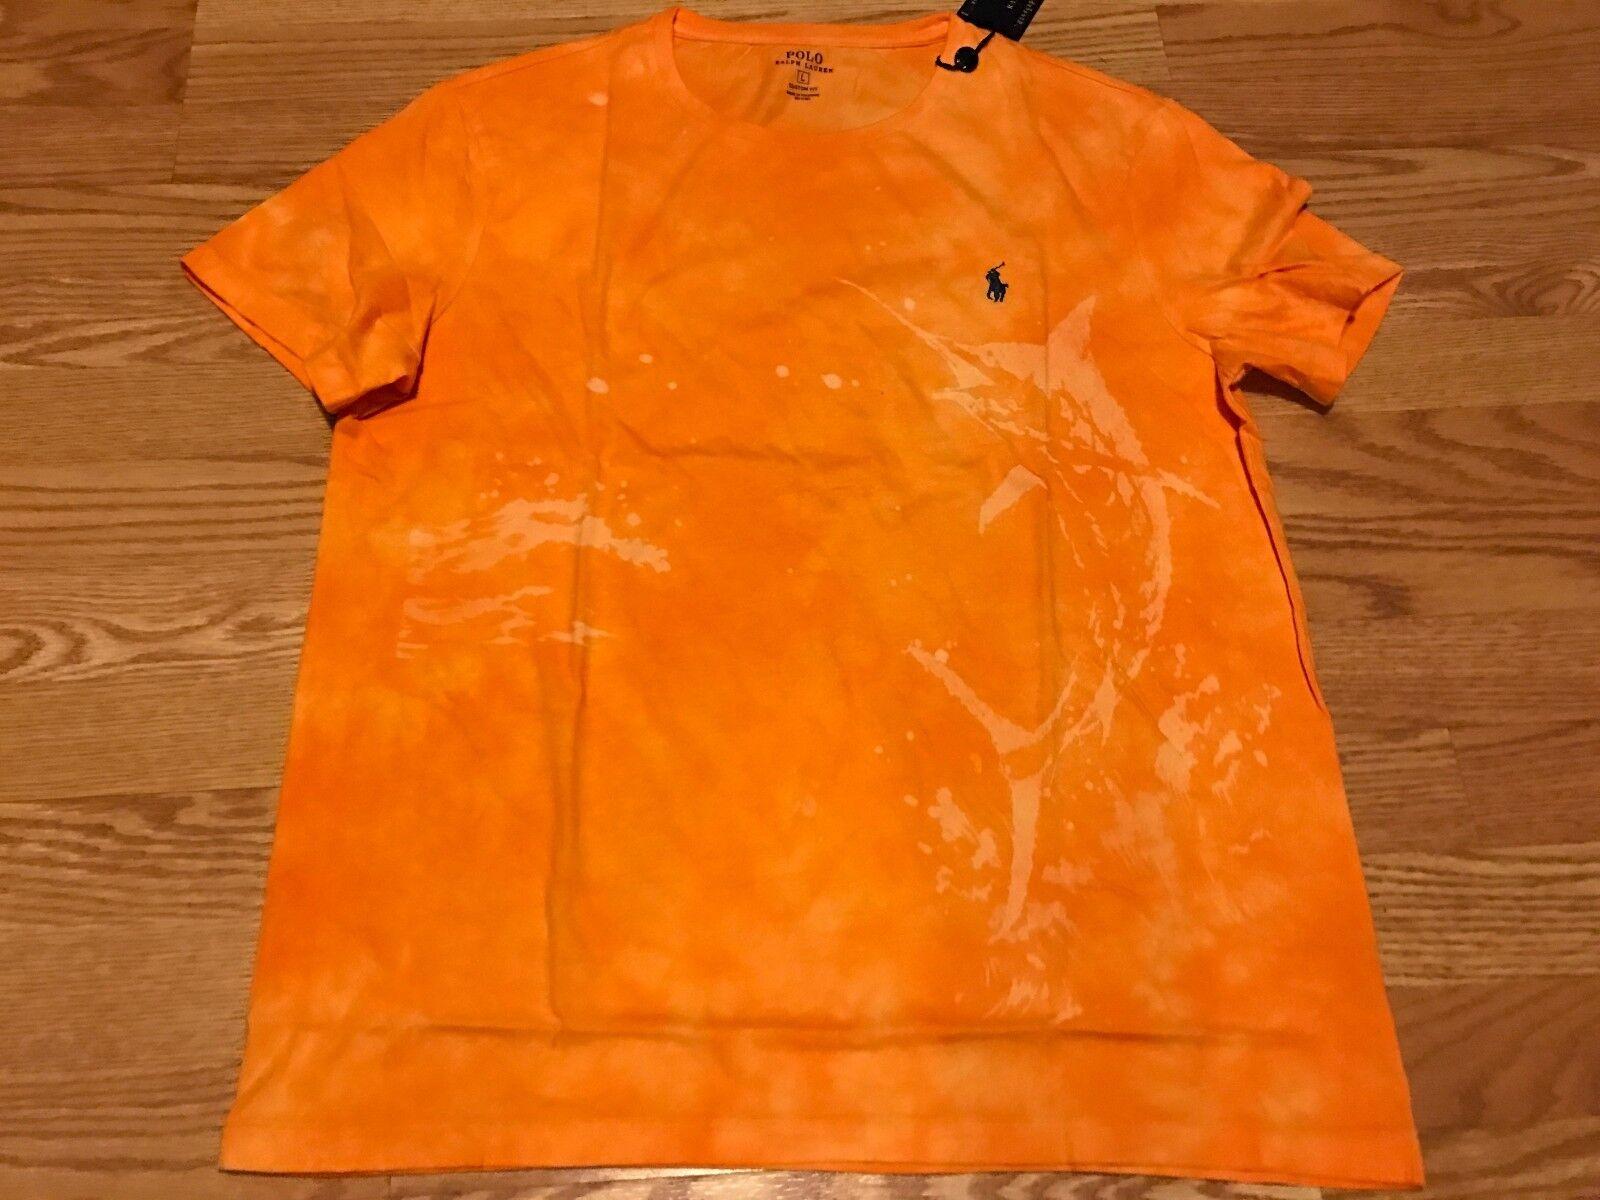 b5d3bc90 Polo Ralph Lauren sun faded distressed sword fish orange t tee shirt pony XL  nwt